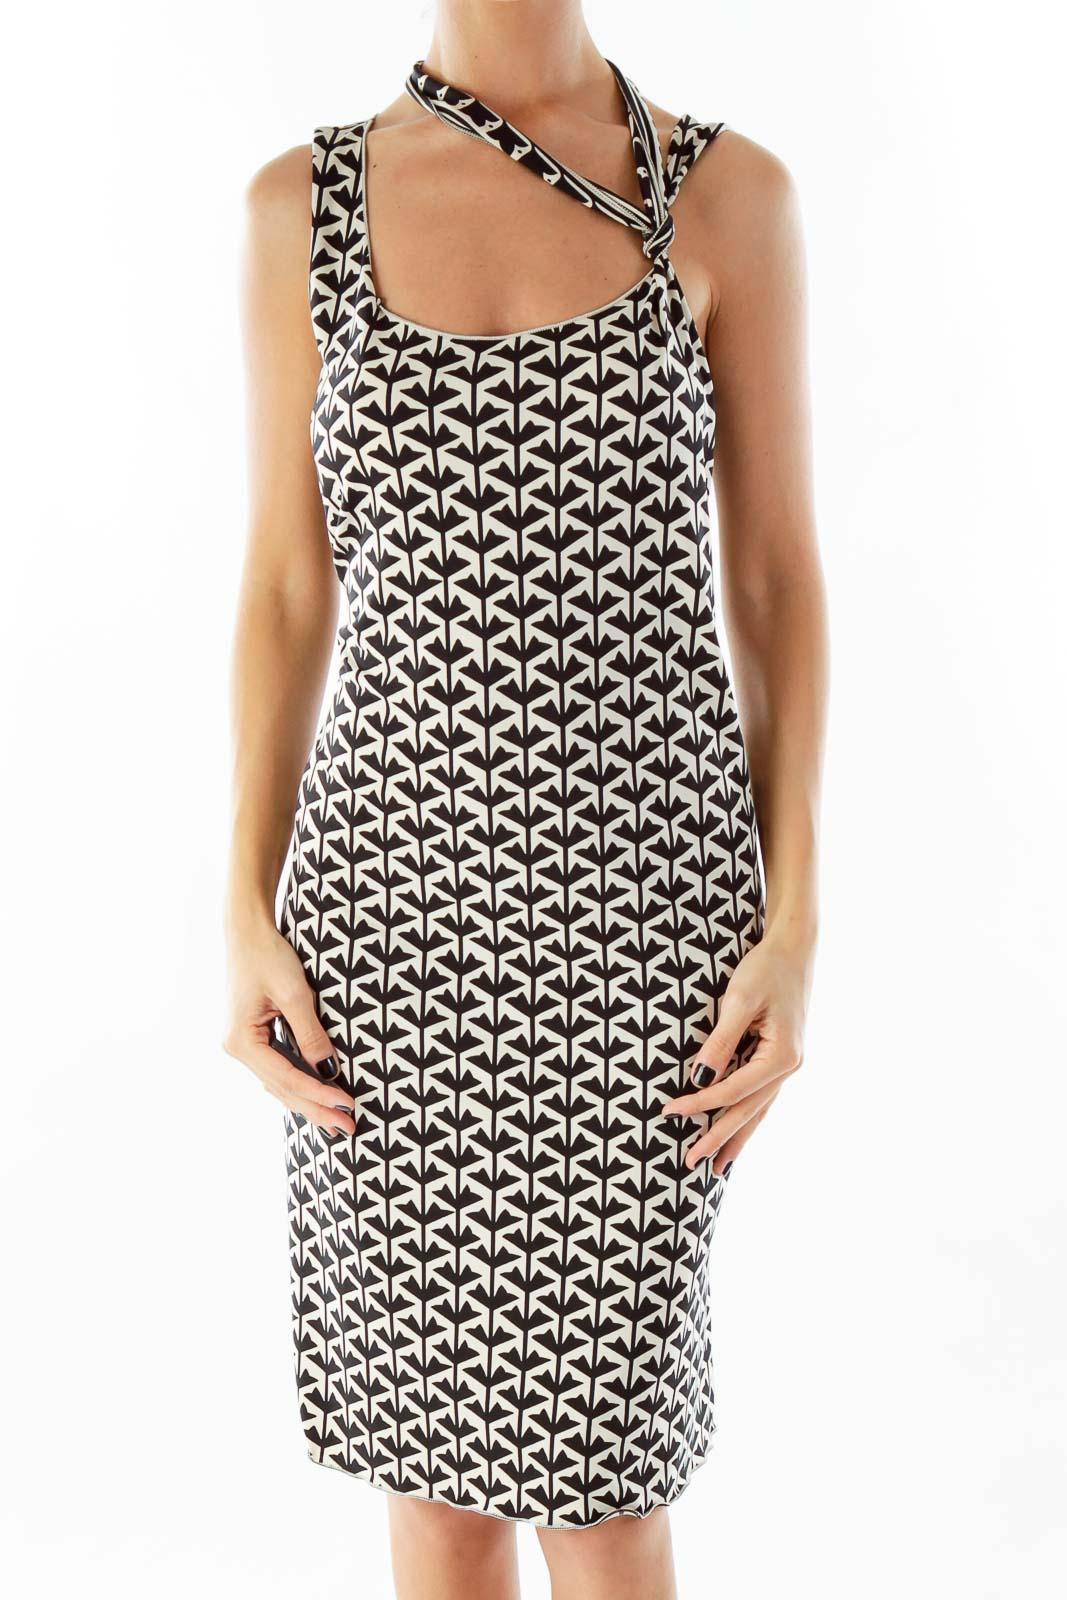 Black Cream Floral Print Dress Front